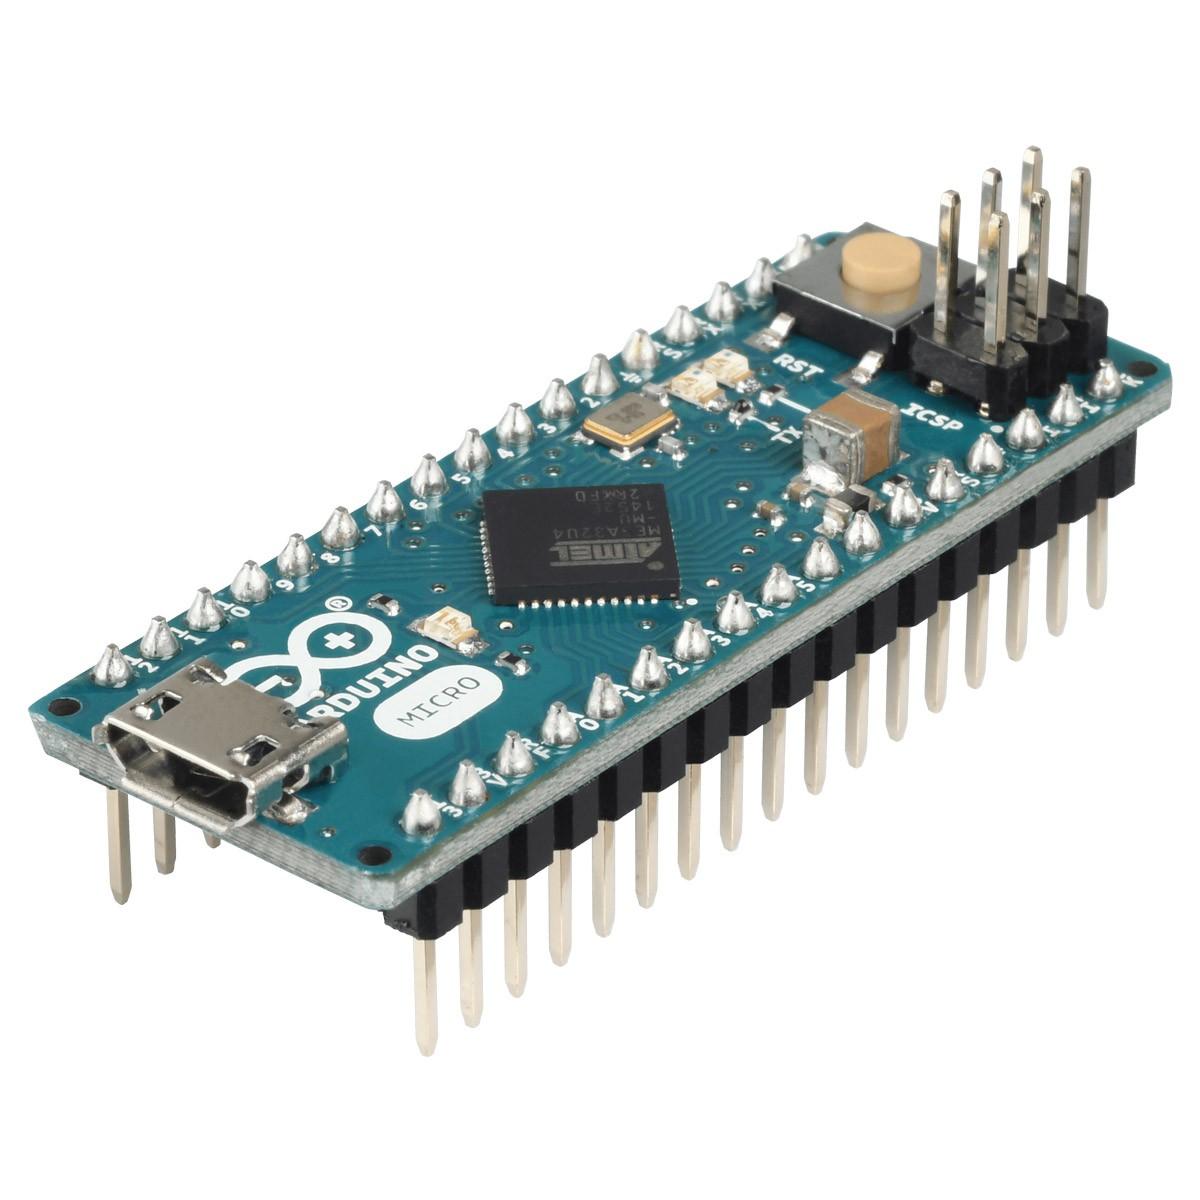 ARDUINO MICRO Microcontroller Board ATmega32U4 Micro USB I/O 20 Pins